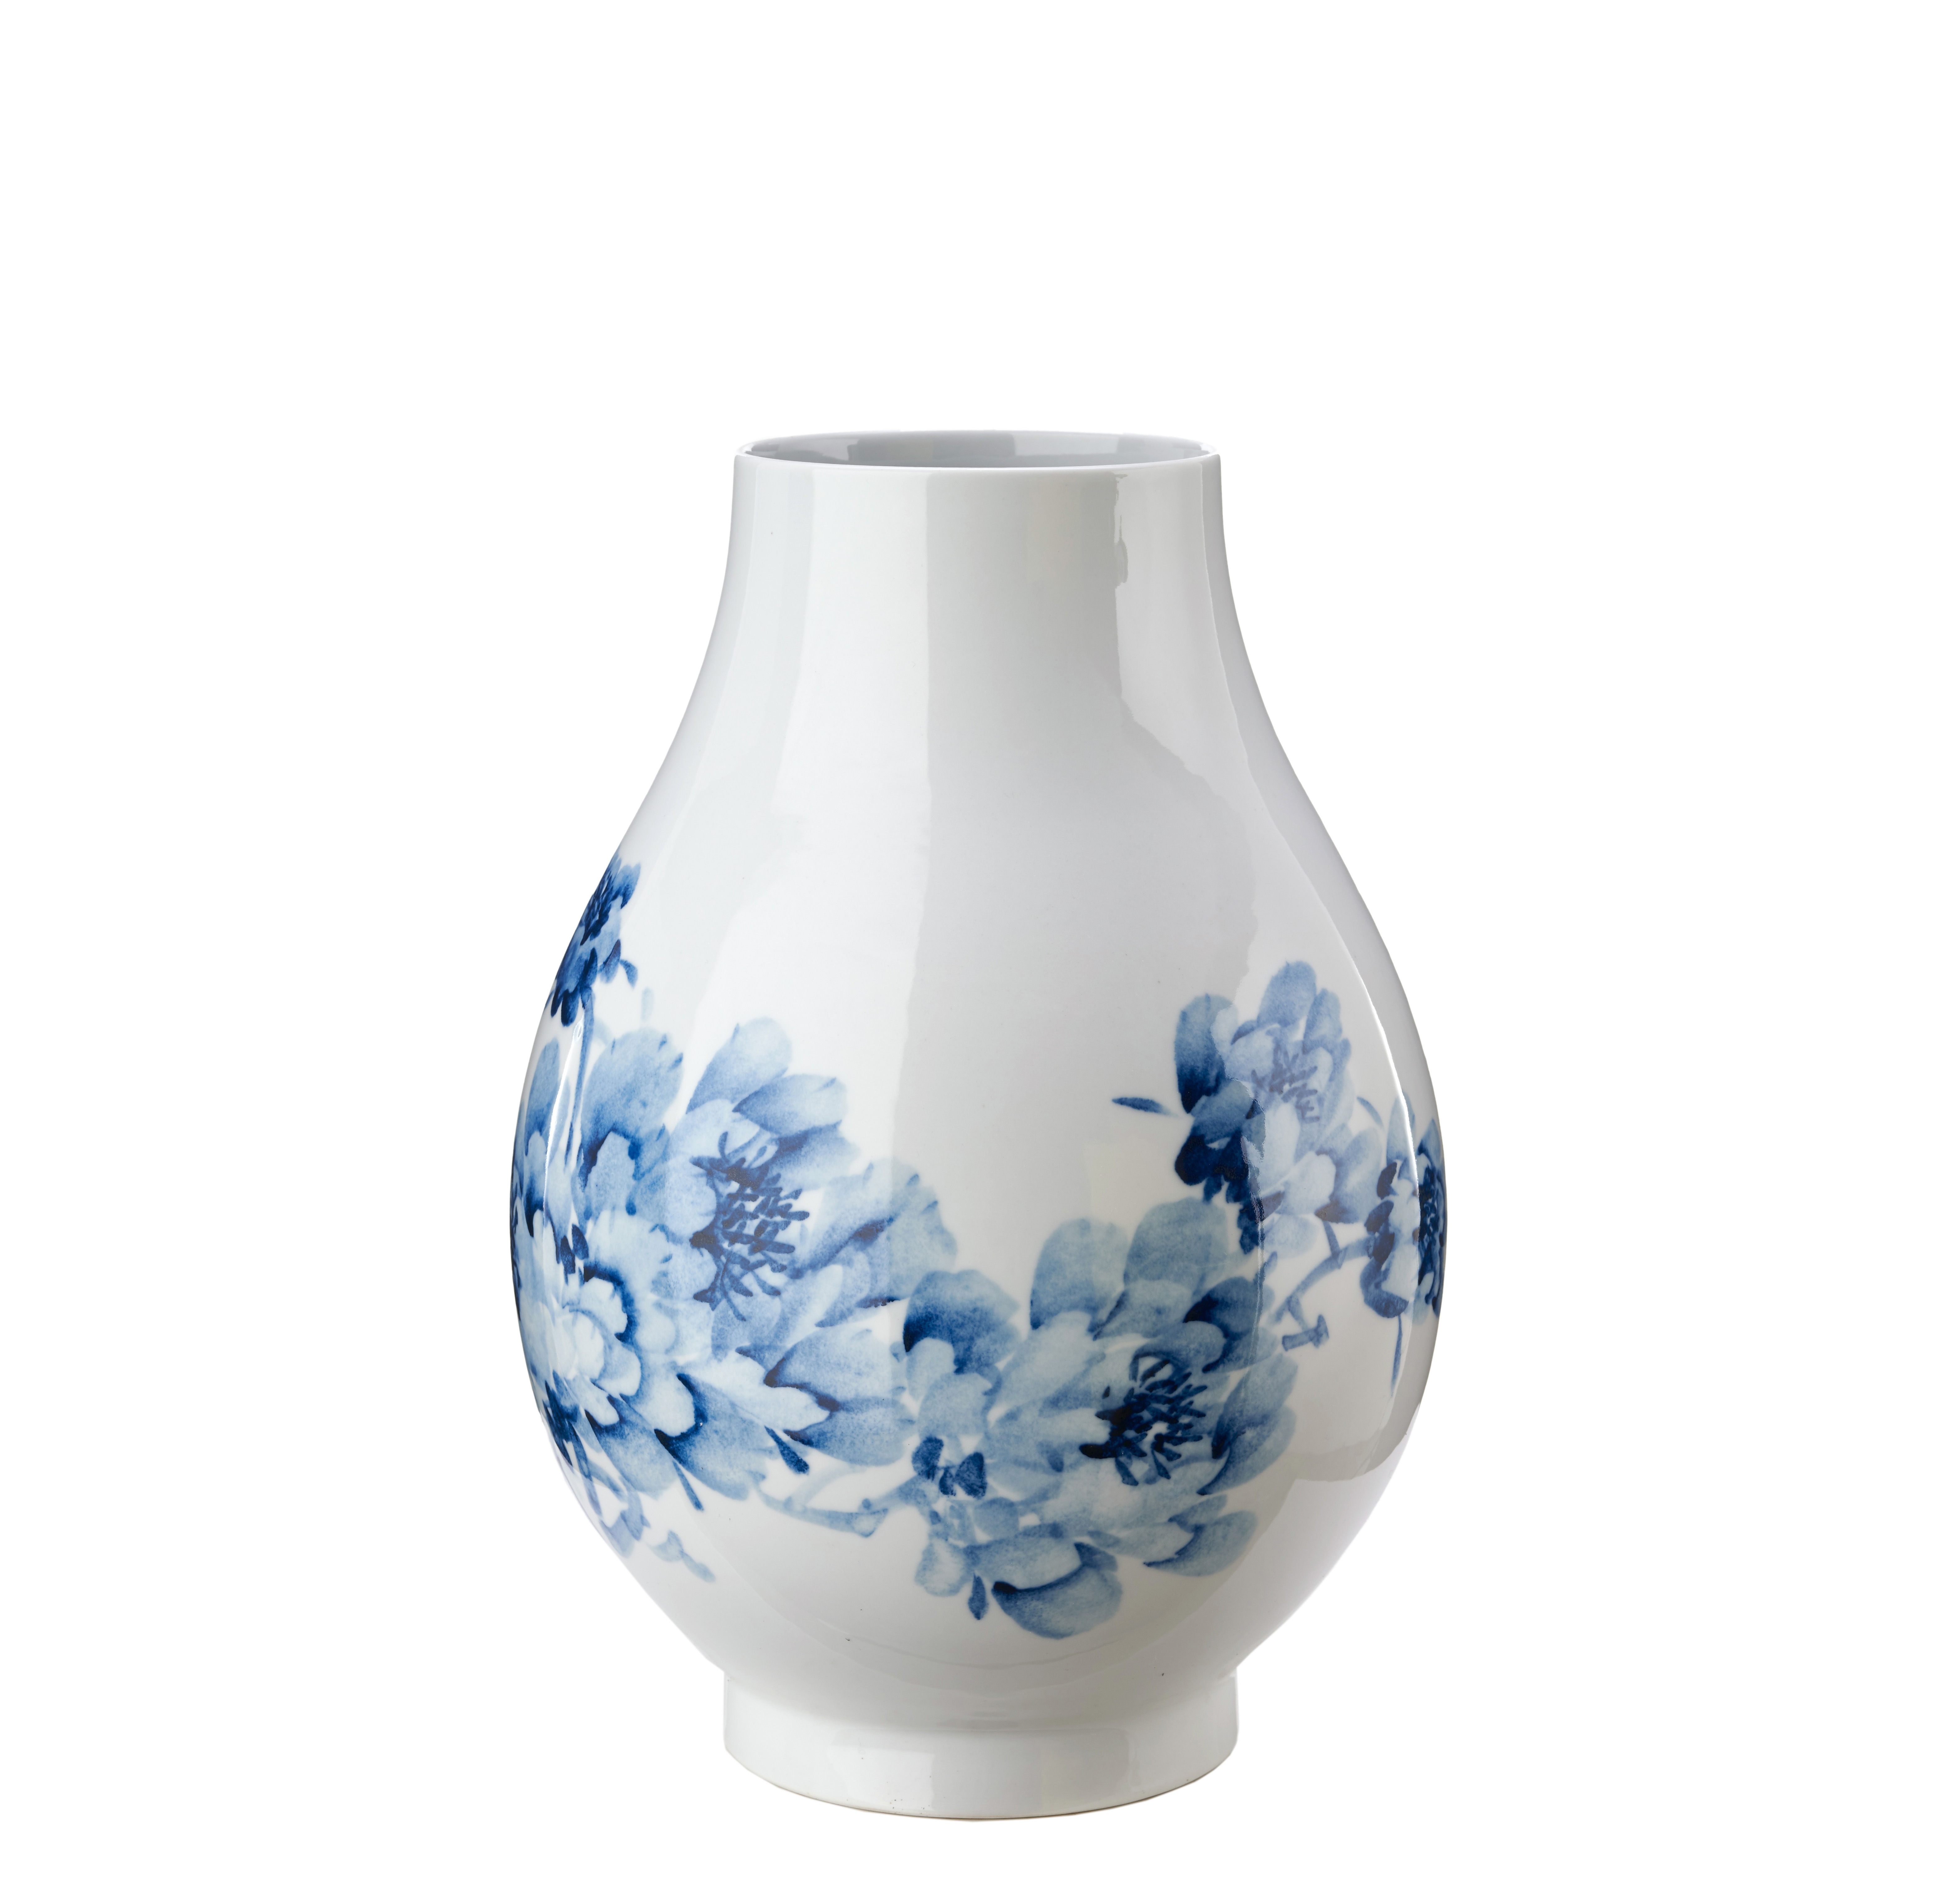 Interni - Vasi - Vaso Peony - / Ø 28 x H 40 cm di Pols Potten - Blu - Porcellana vetrificata